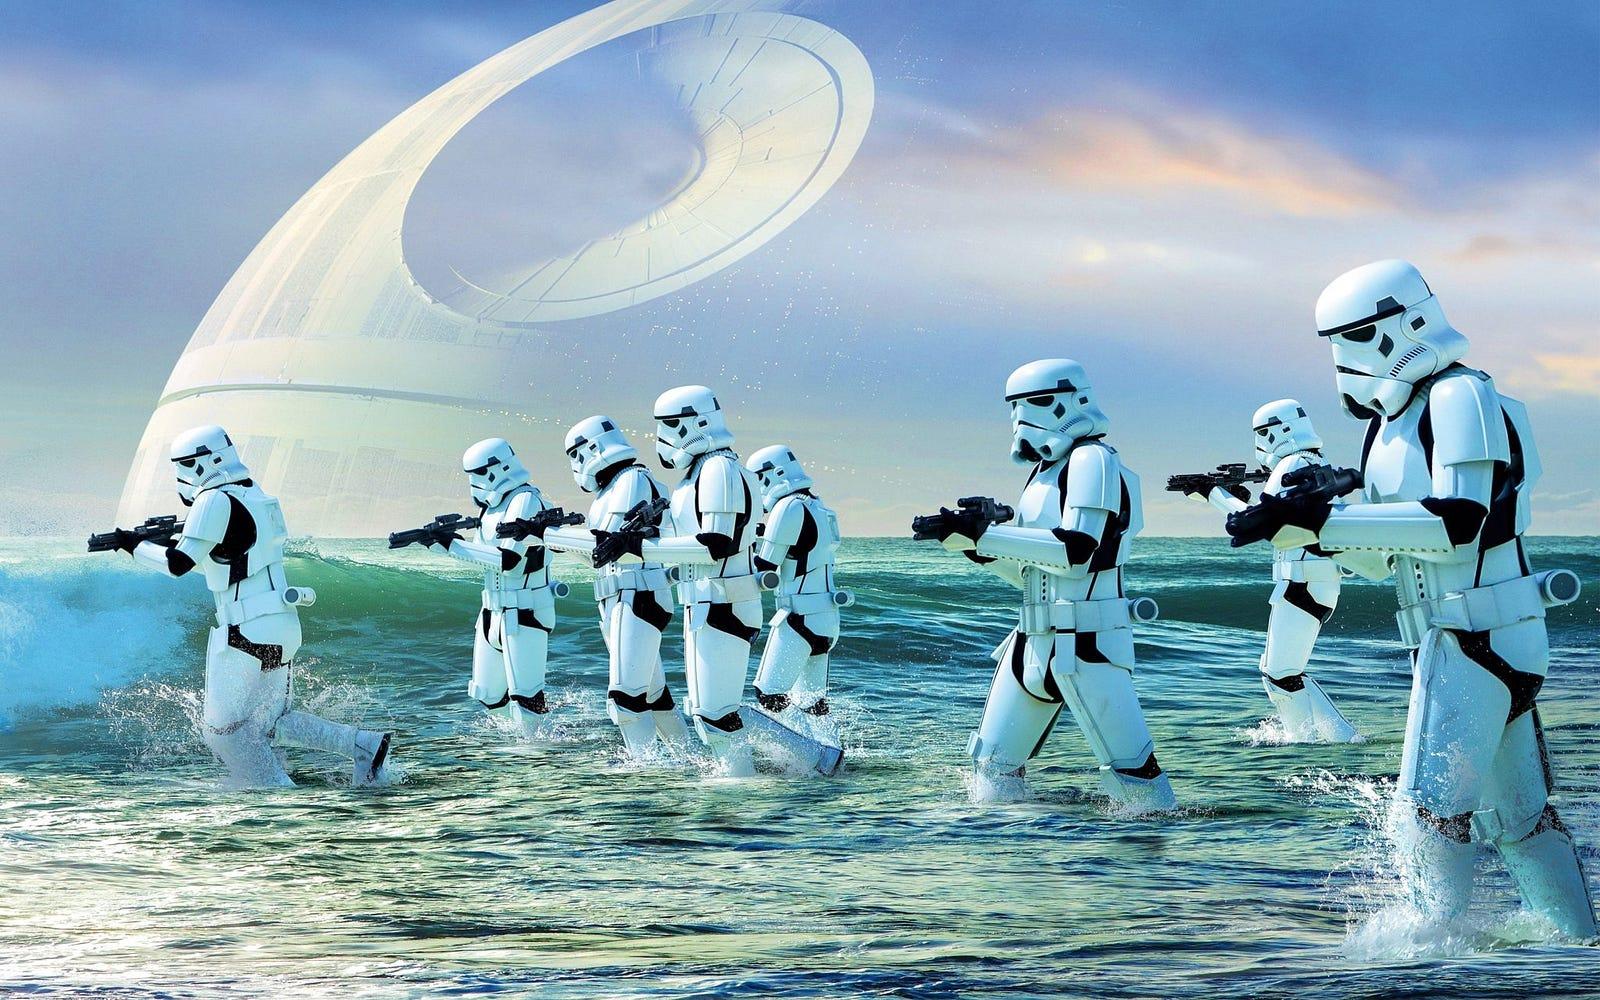 Rogue One Stormtrooper Wallpaper